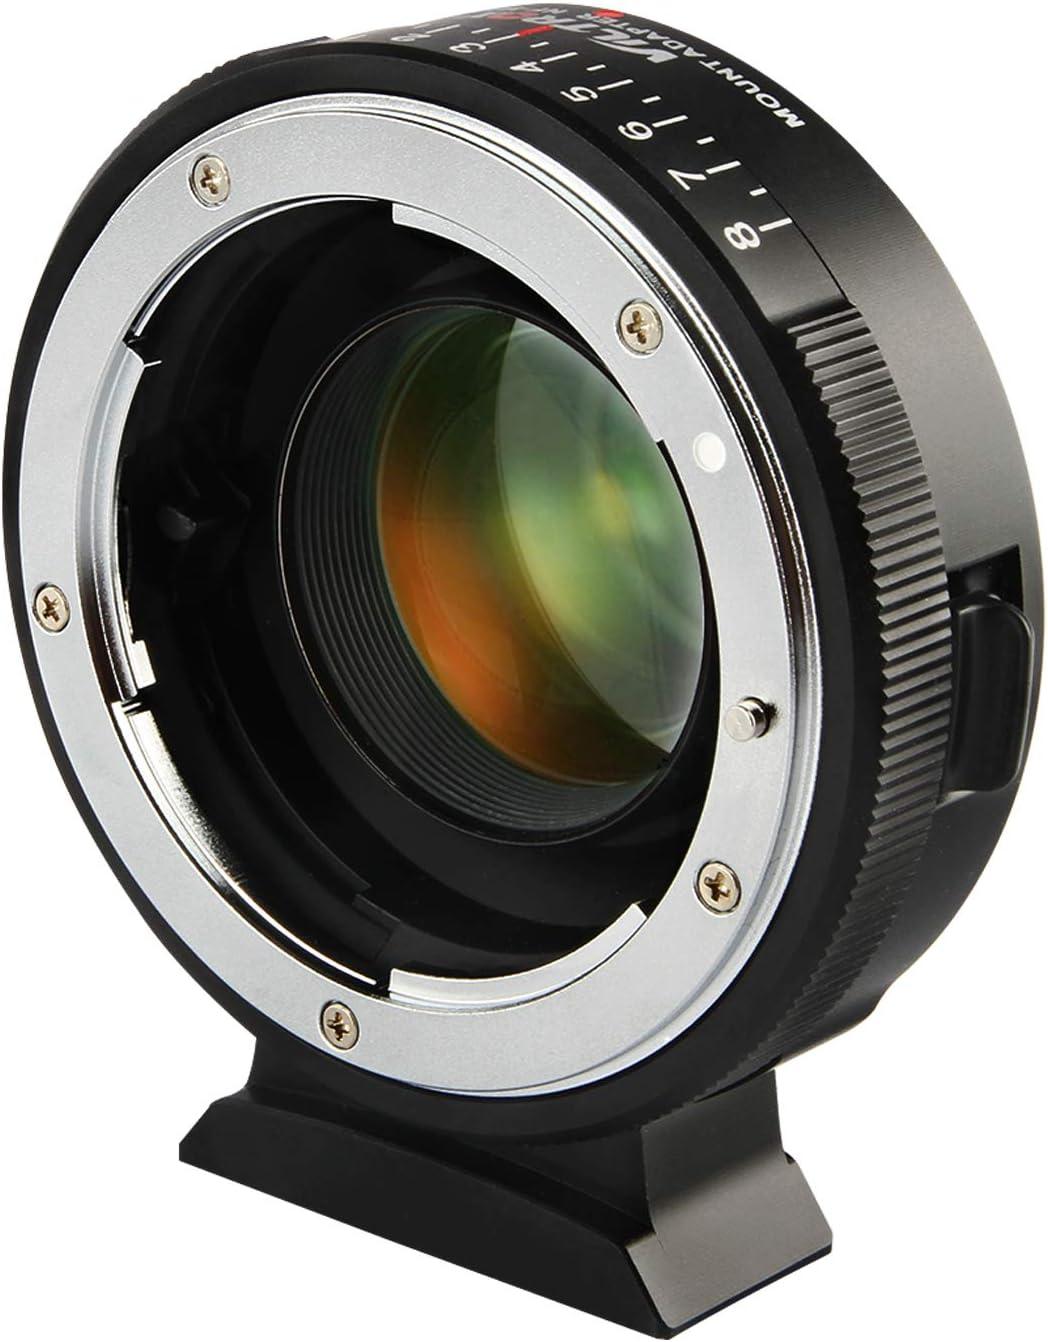 Viltrox NF-M43X Manual Focus 0.71x Reducer Speed Booster Lens Mount Adapter w//Aperture Control for Nikon G D Lens to M4//3 Mirrorless Camera GH5 GH4 GF9 GX85 GX8 E-M5 E-M10 E-PL3 Pen-F BMPCC